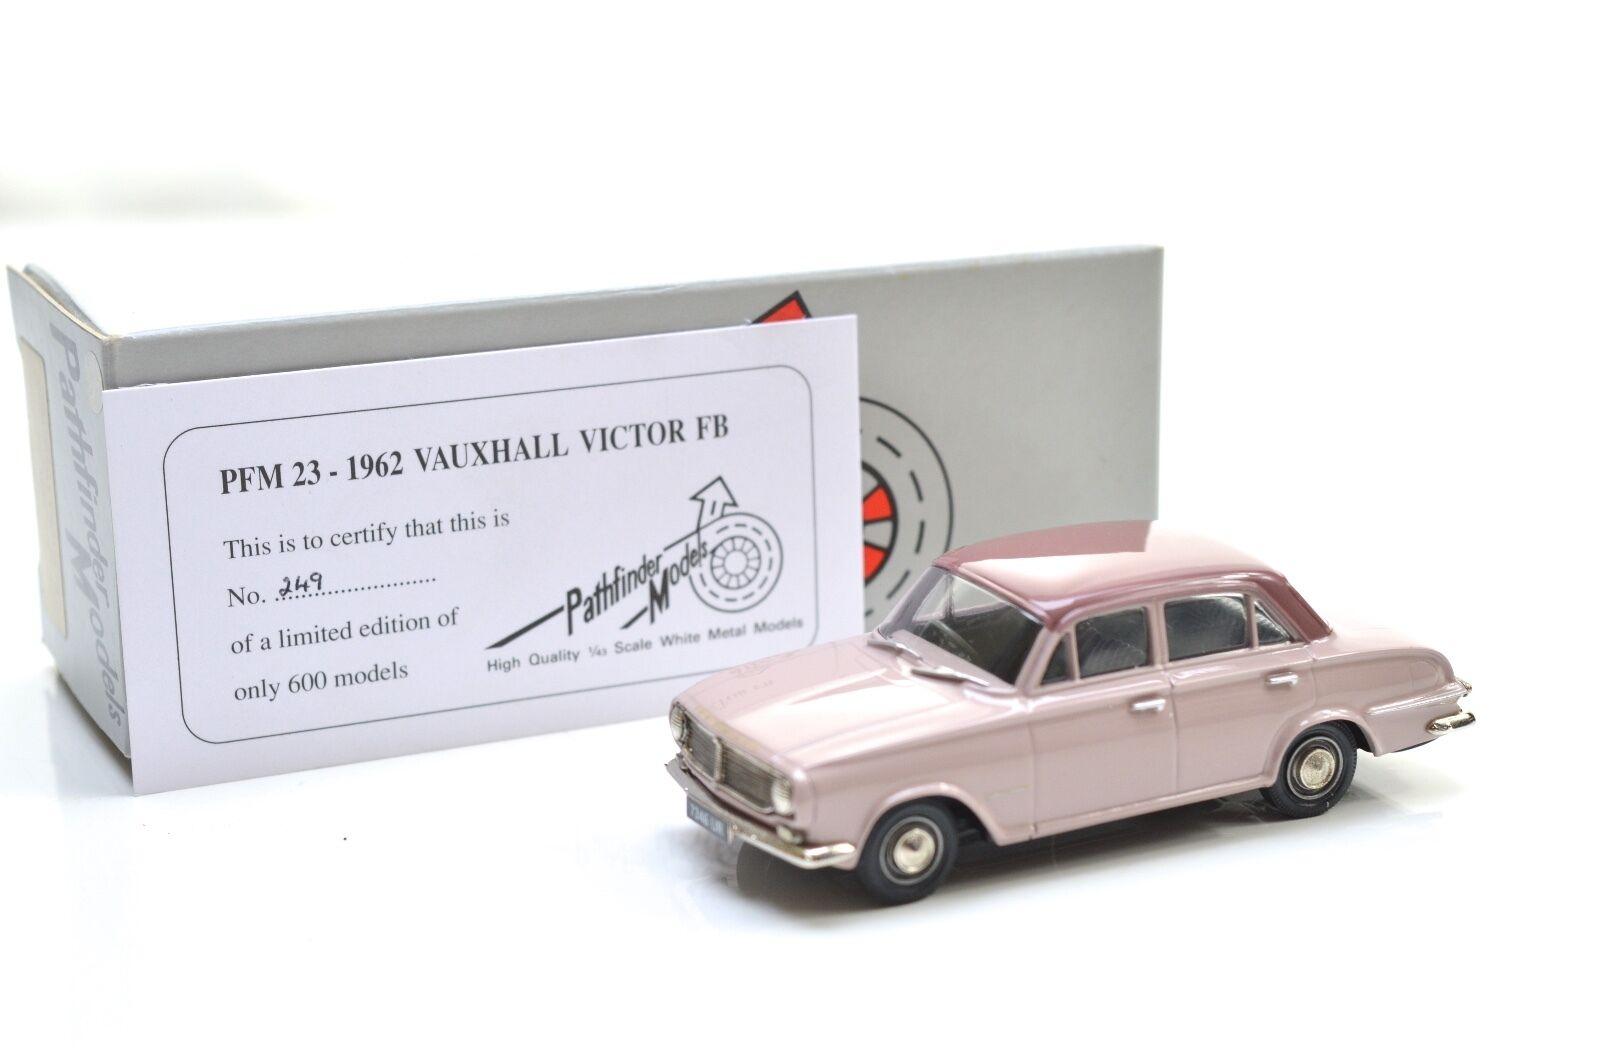 PATHFINDER modelli PFM 23 Vauxhall Victor FB 1962